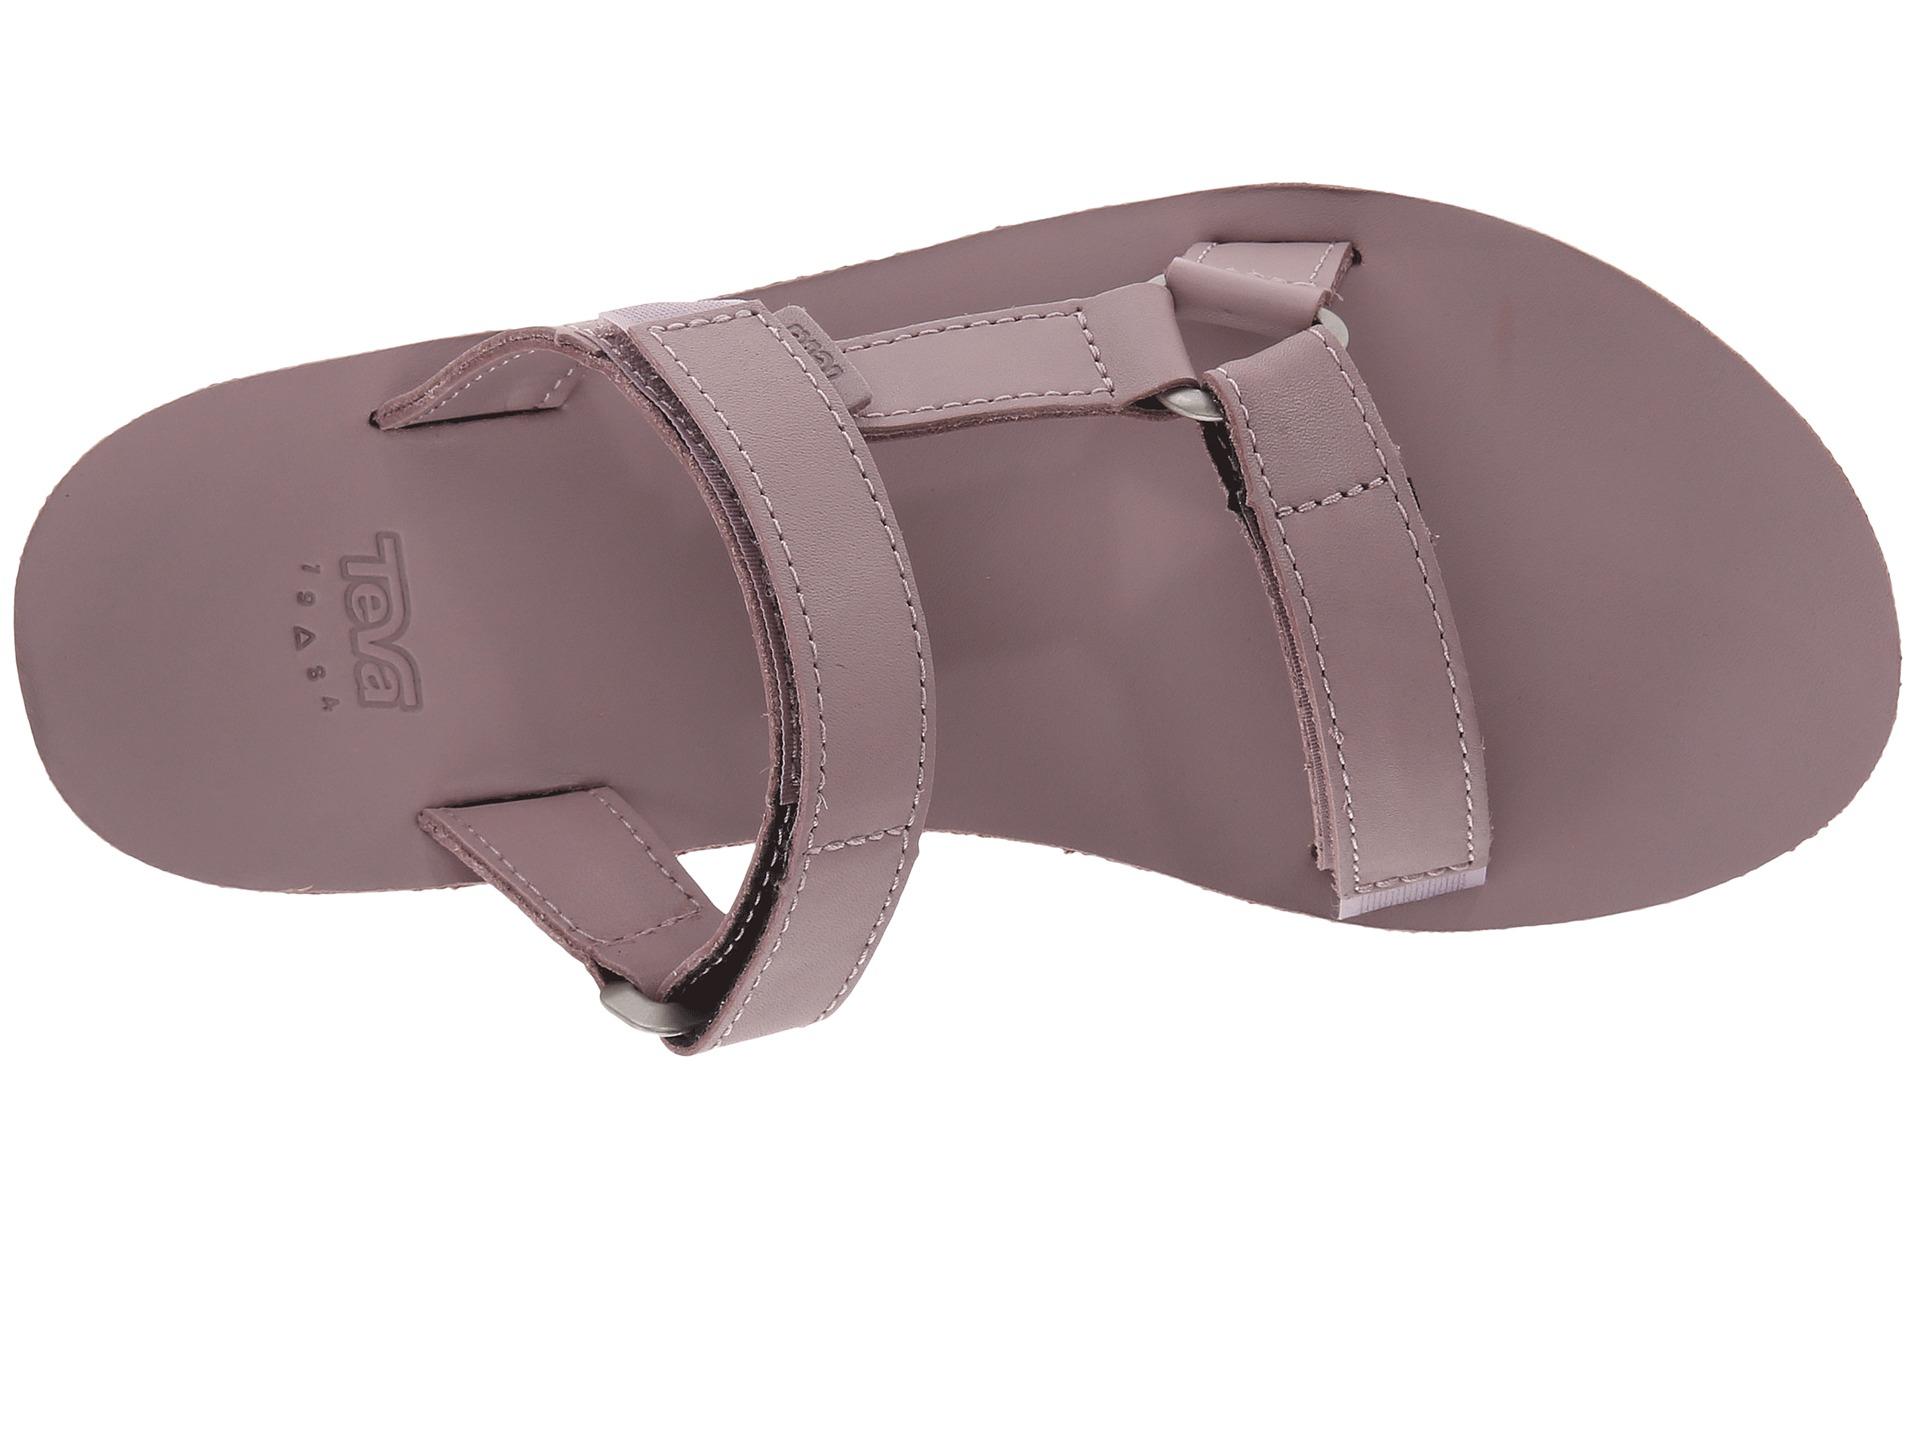 a4b851844b79 Lyst - Teva Universal Slide Leather in Purple